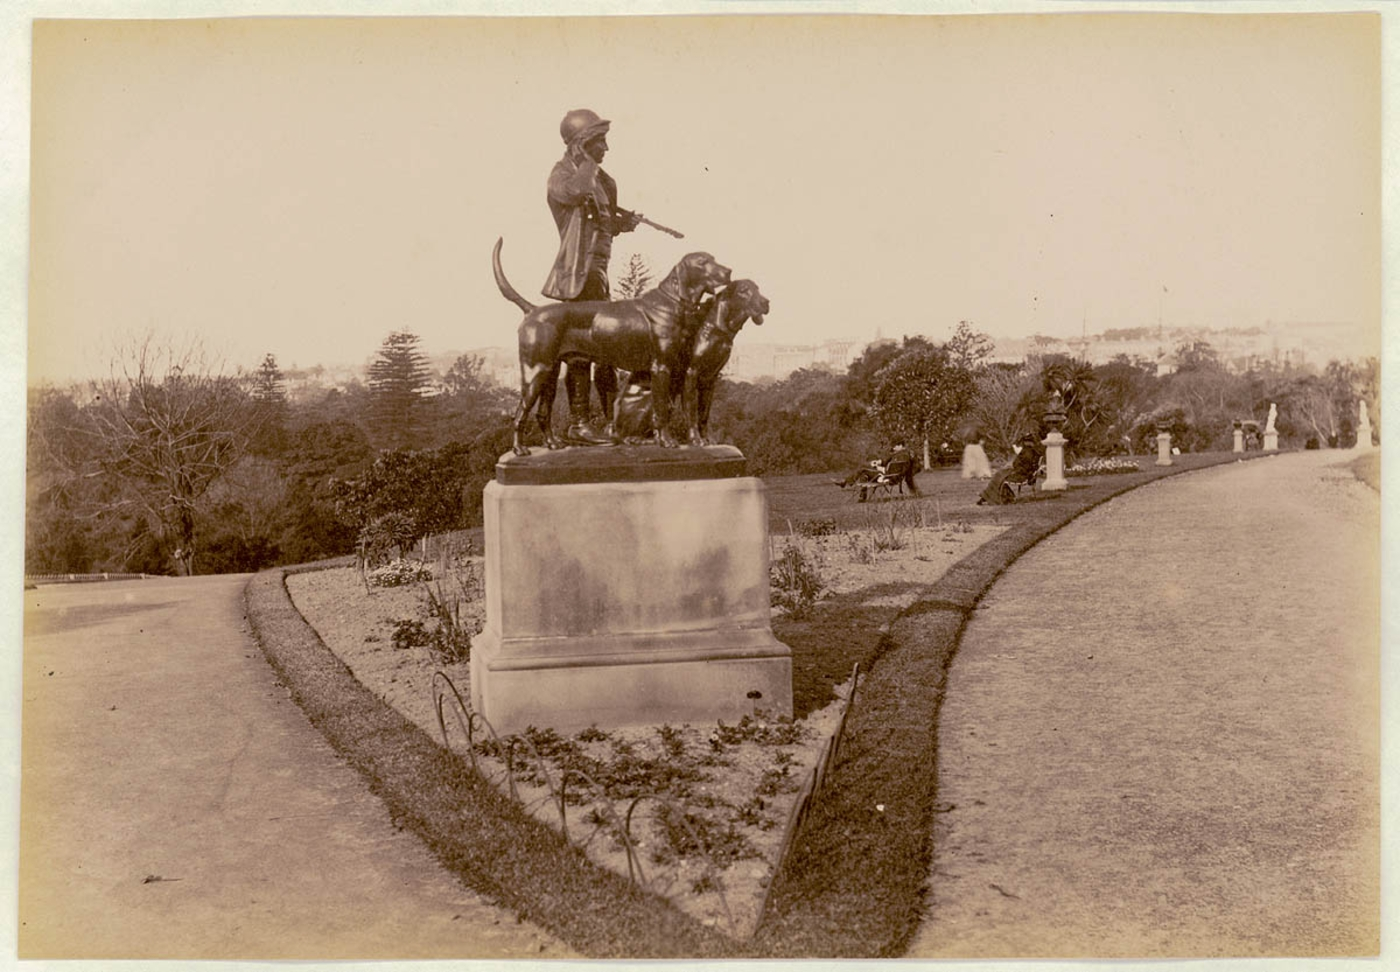 Botanical Gardens, Sydney, [showing Hunstman and Dogs sculpture] c. 1900-1910